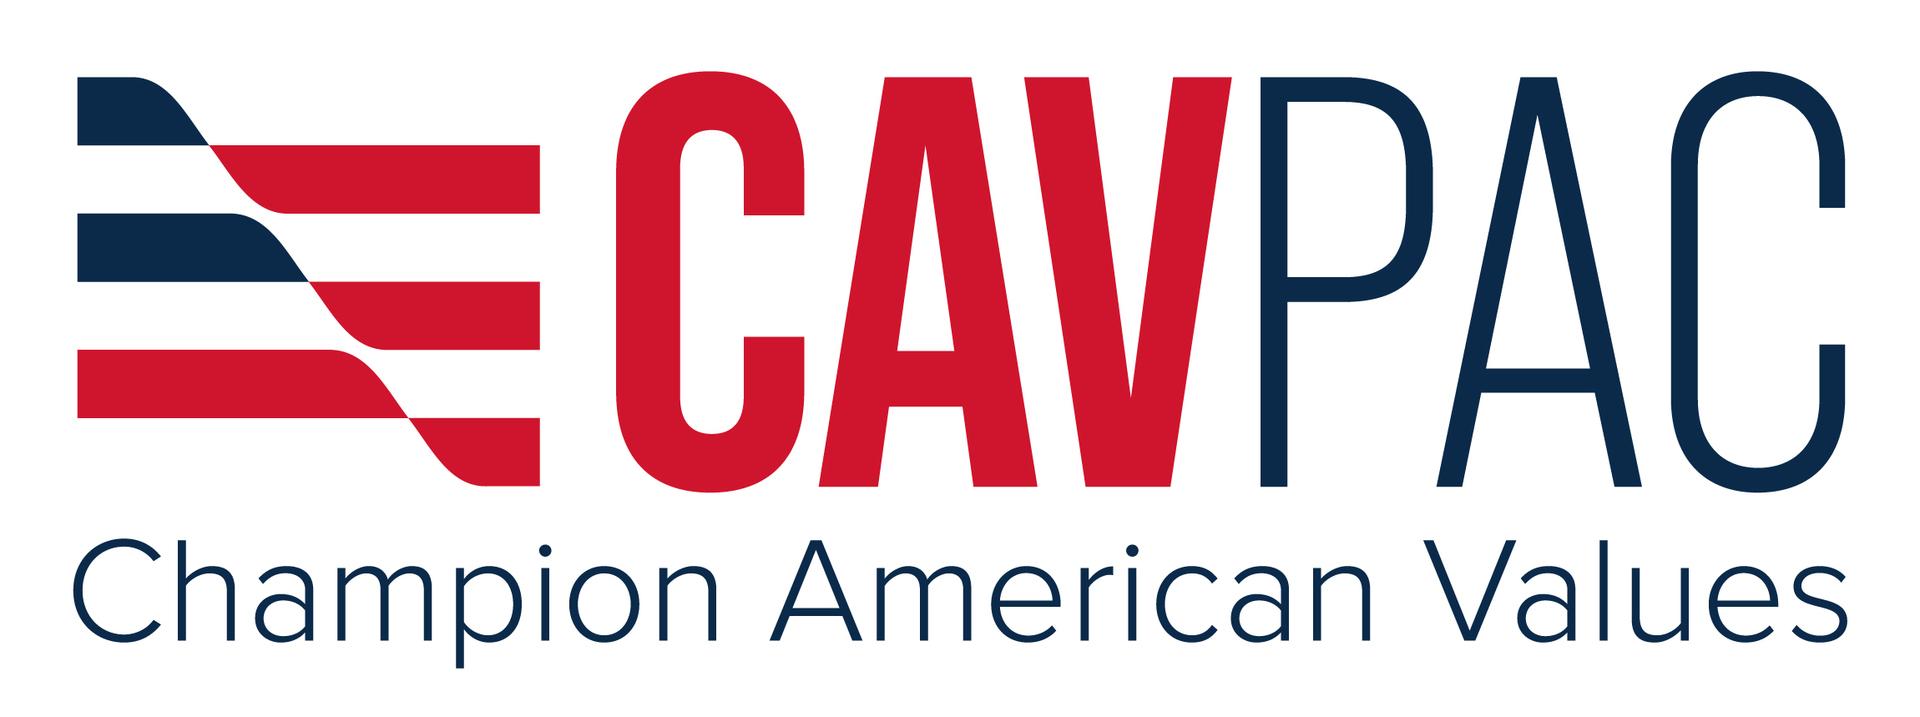 Cav pac logo white background